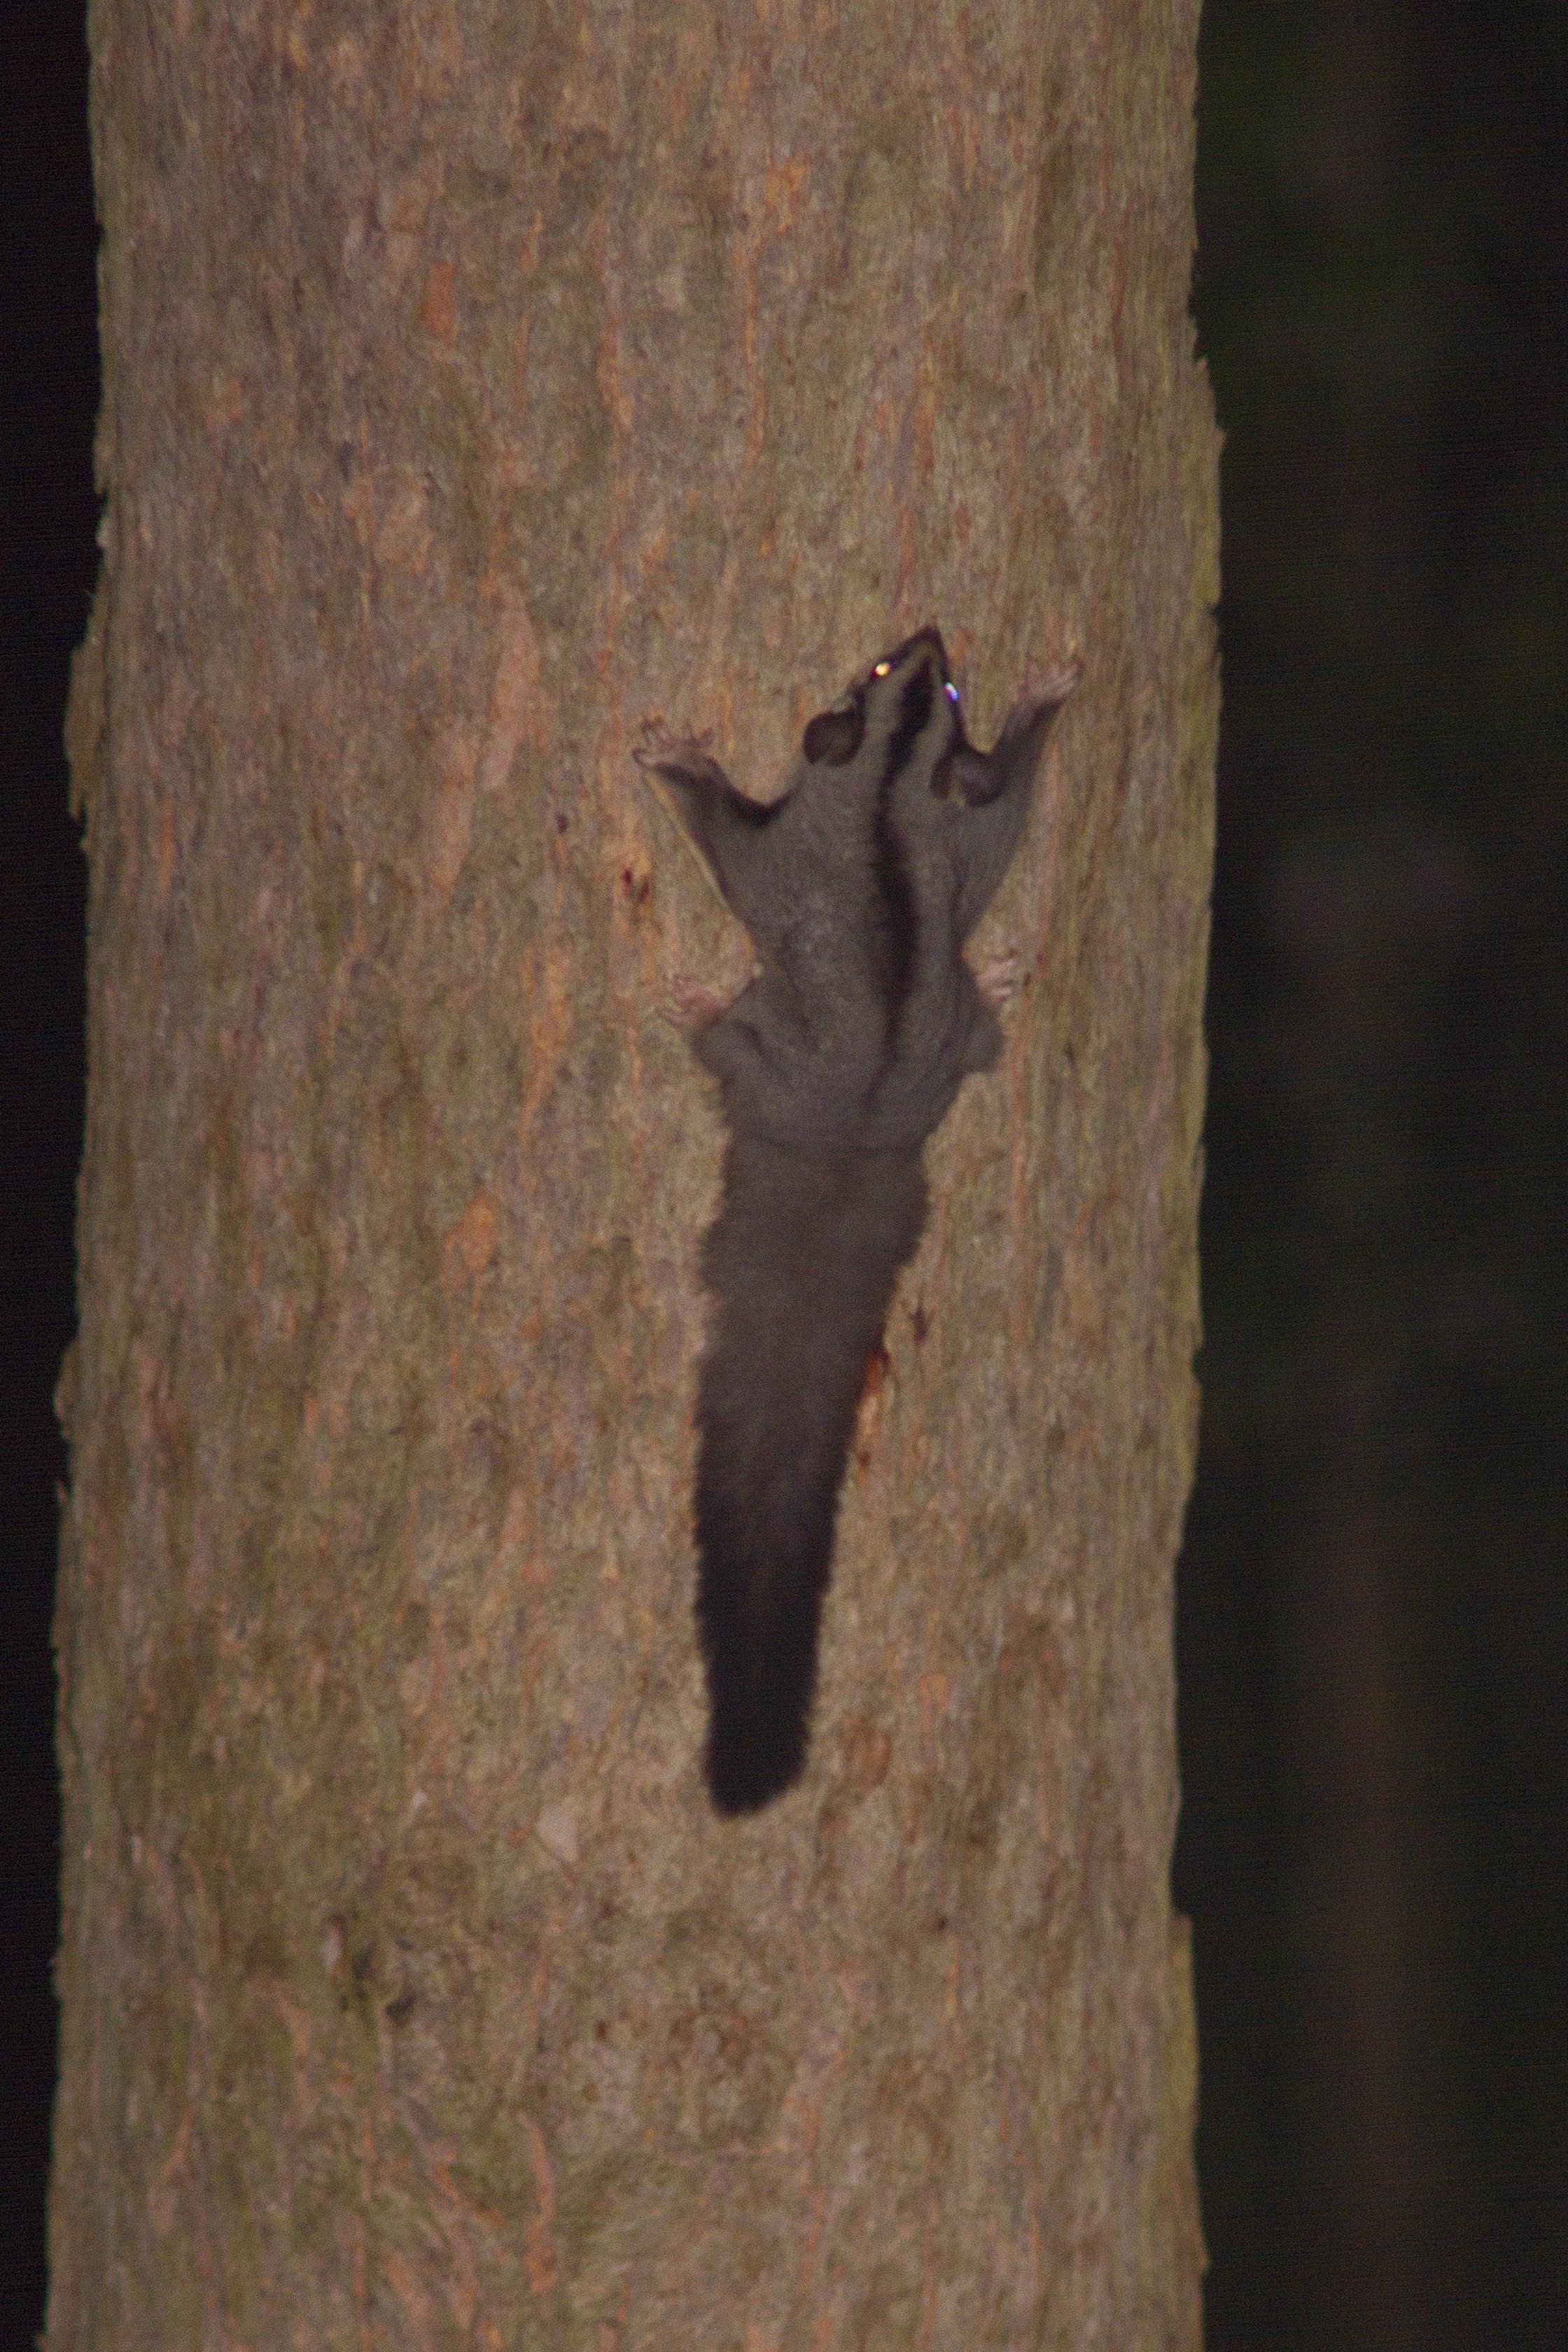 Squirrel Glider - A Moore - 21 March 11